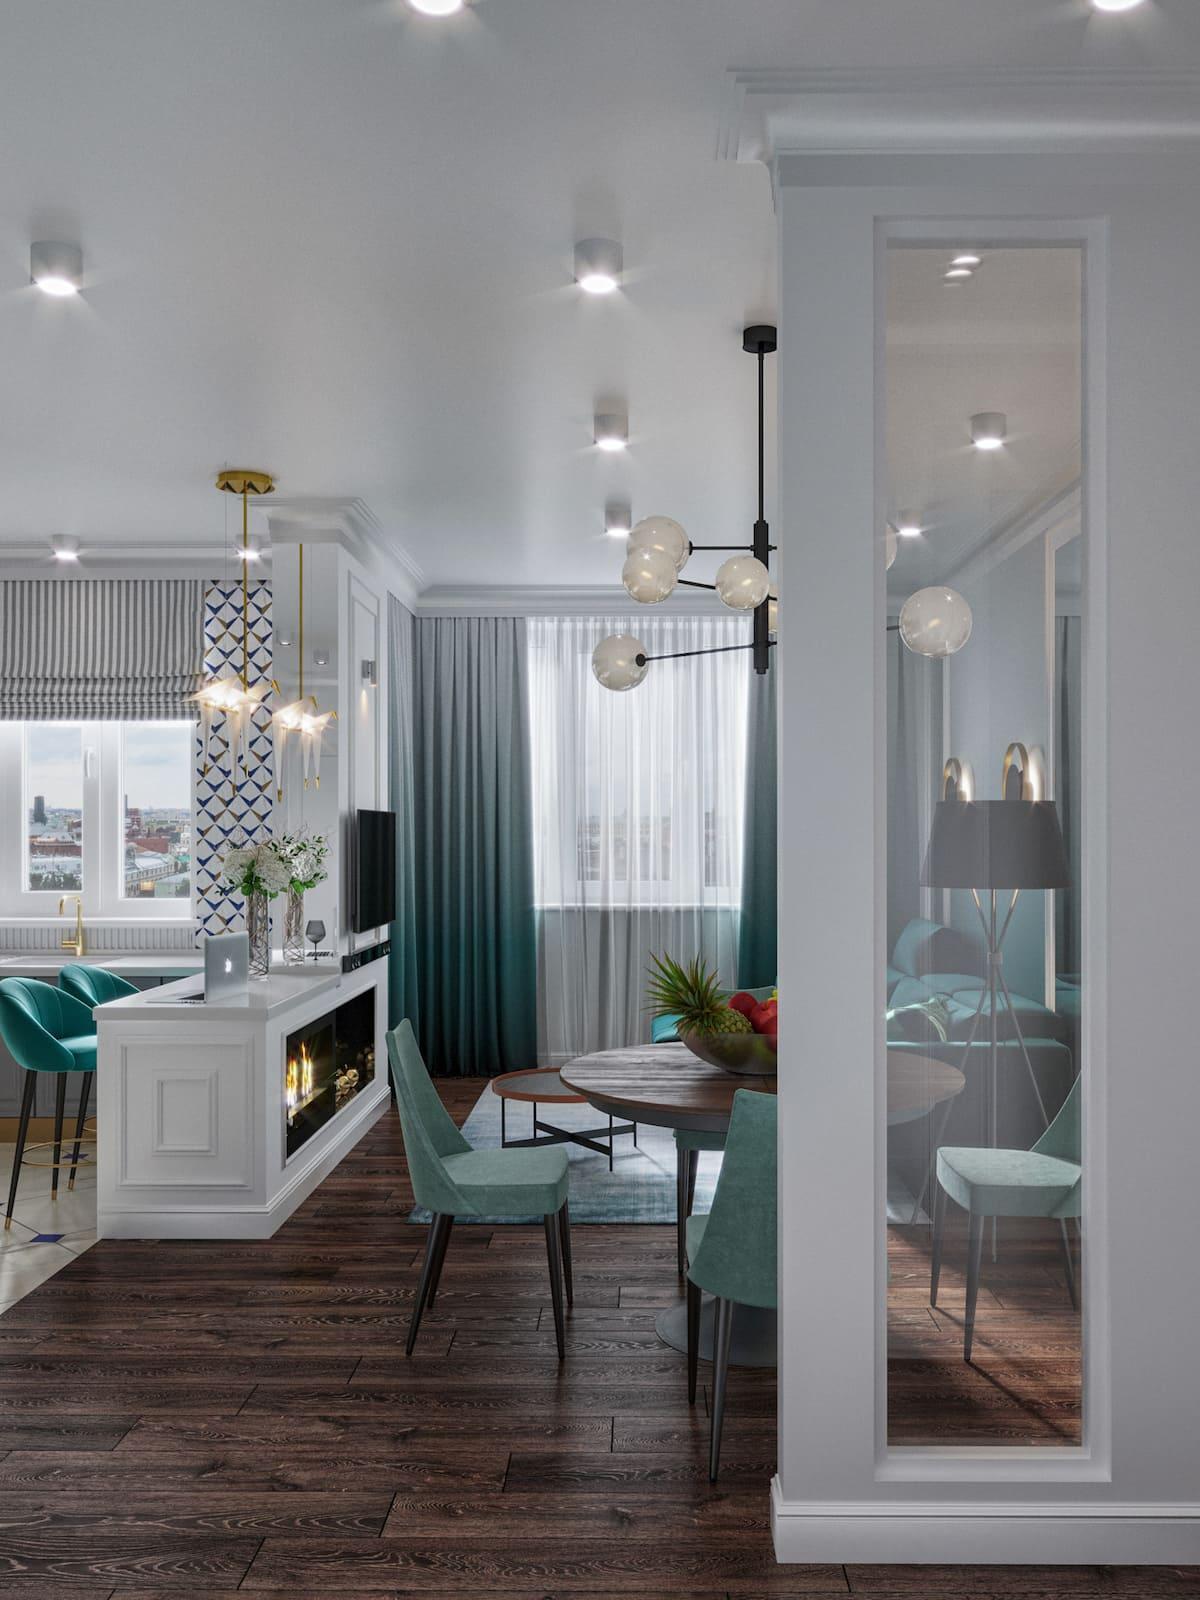 дизайн интерьера модной квартиры фото 35